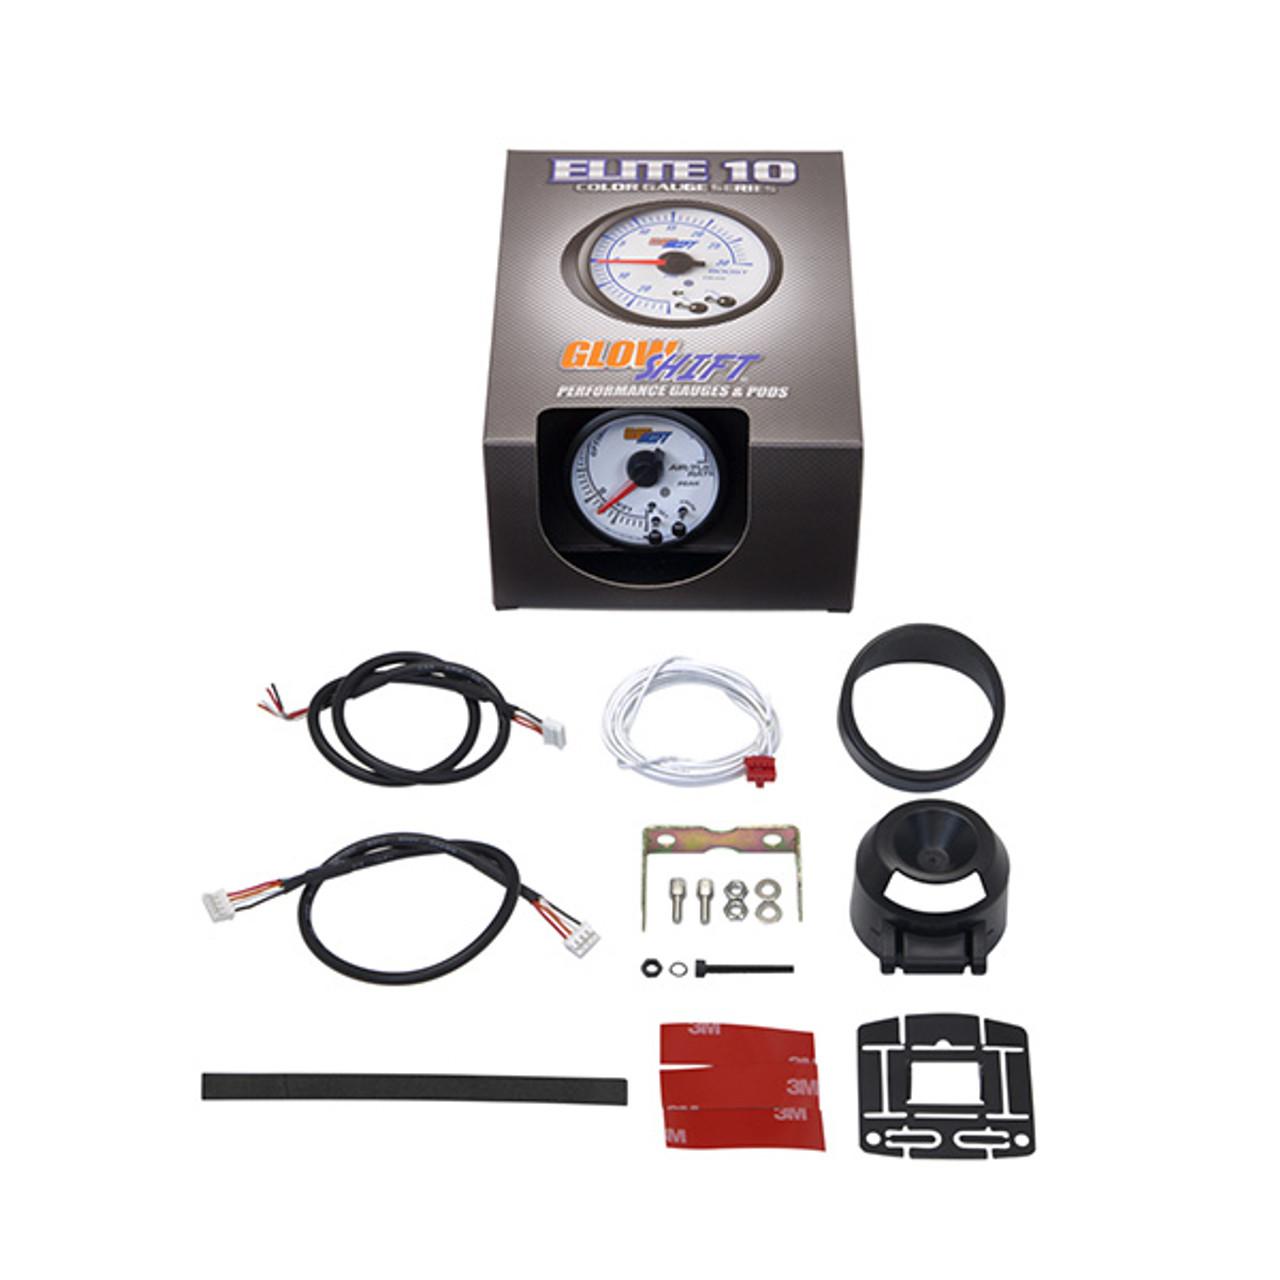 GlowShift White Elite 10 Color Air/Fuel Ratio Gauge